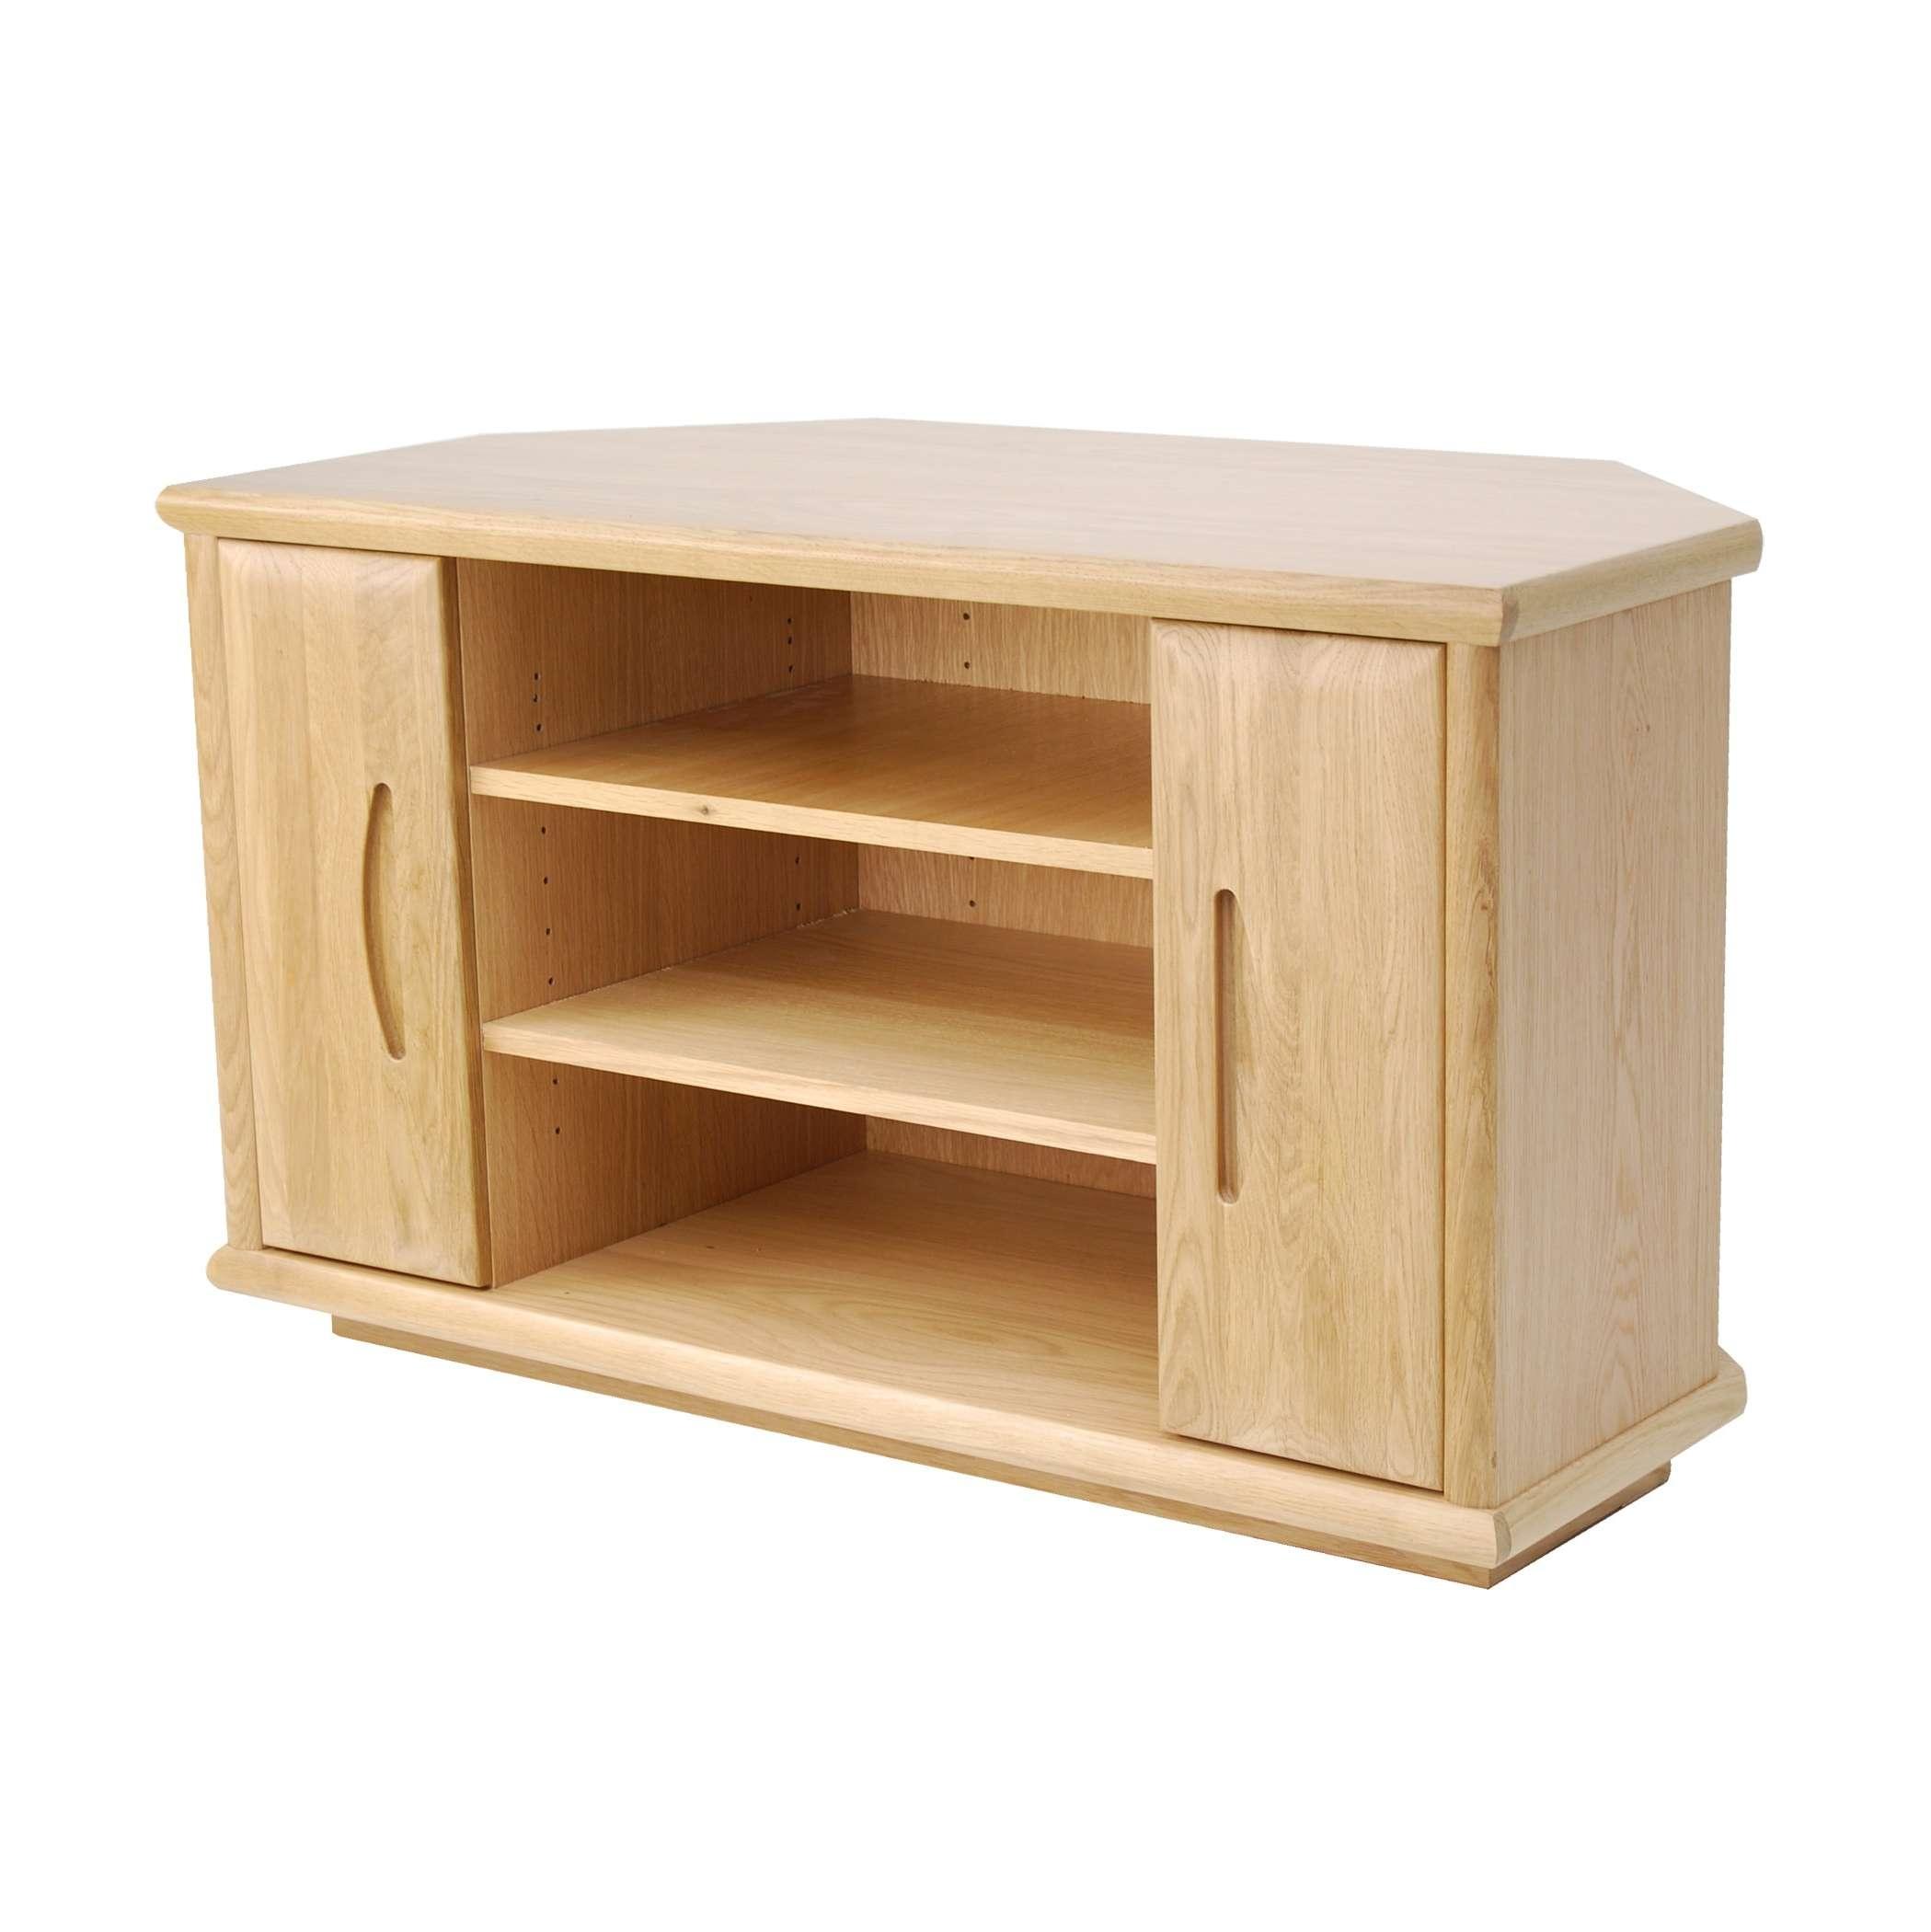 Oak Corner Tv Stand | Gola Furniture Uk In Dark Wood Corner Tv Stands (Gallery 5 of 15)